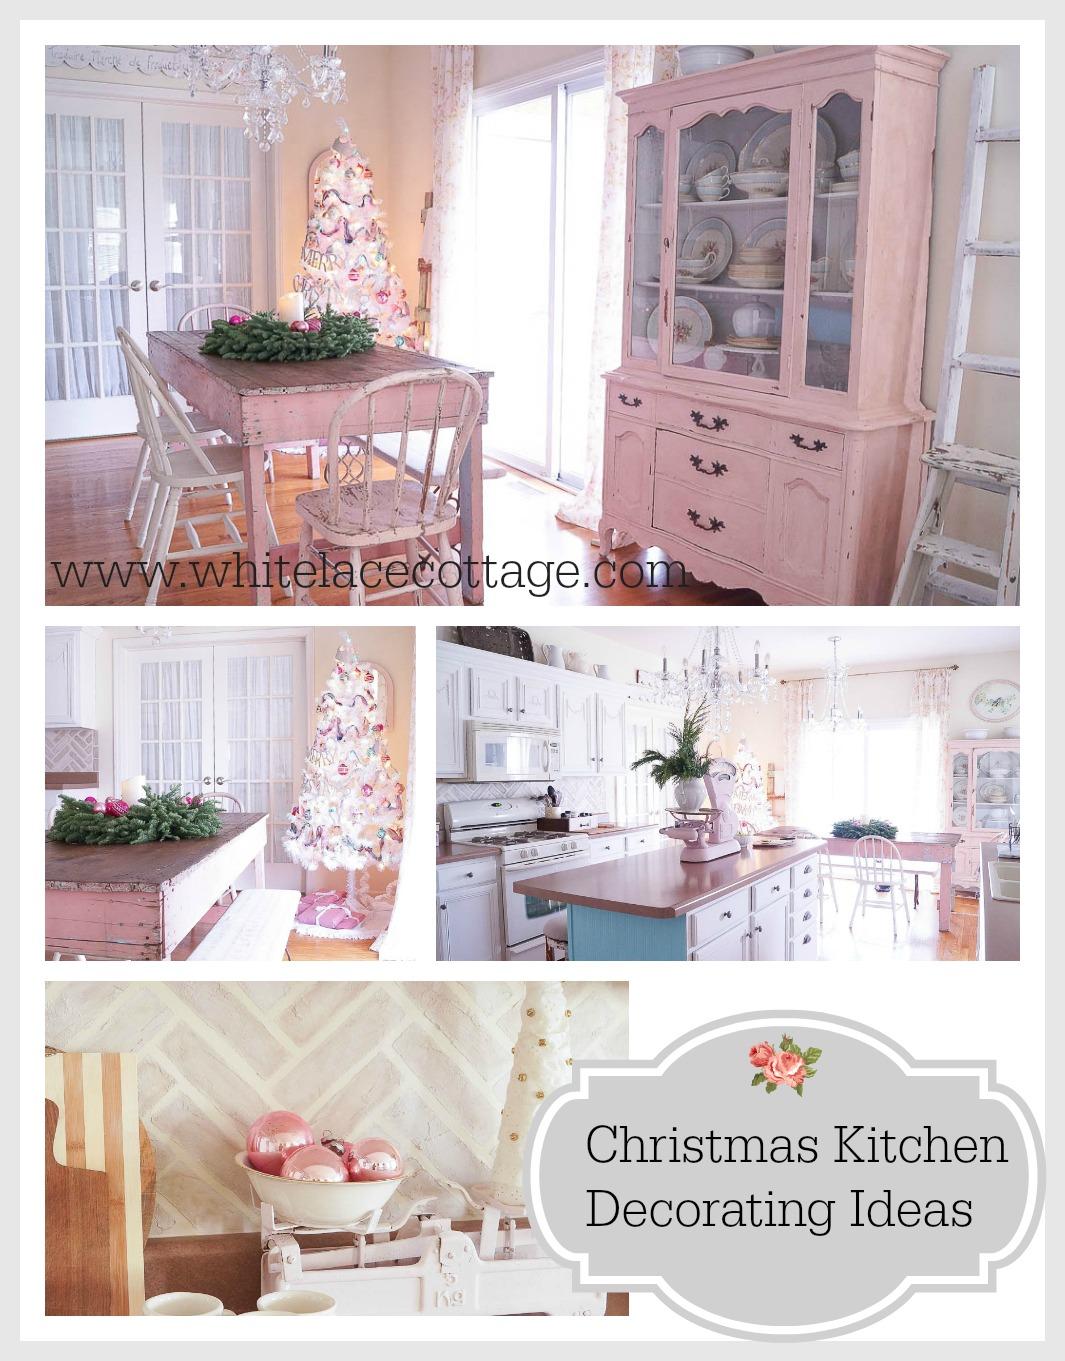 Christmas kitchen decorating ideas white lace cottage for Kitchen ideas christmas